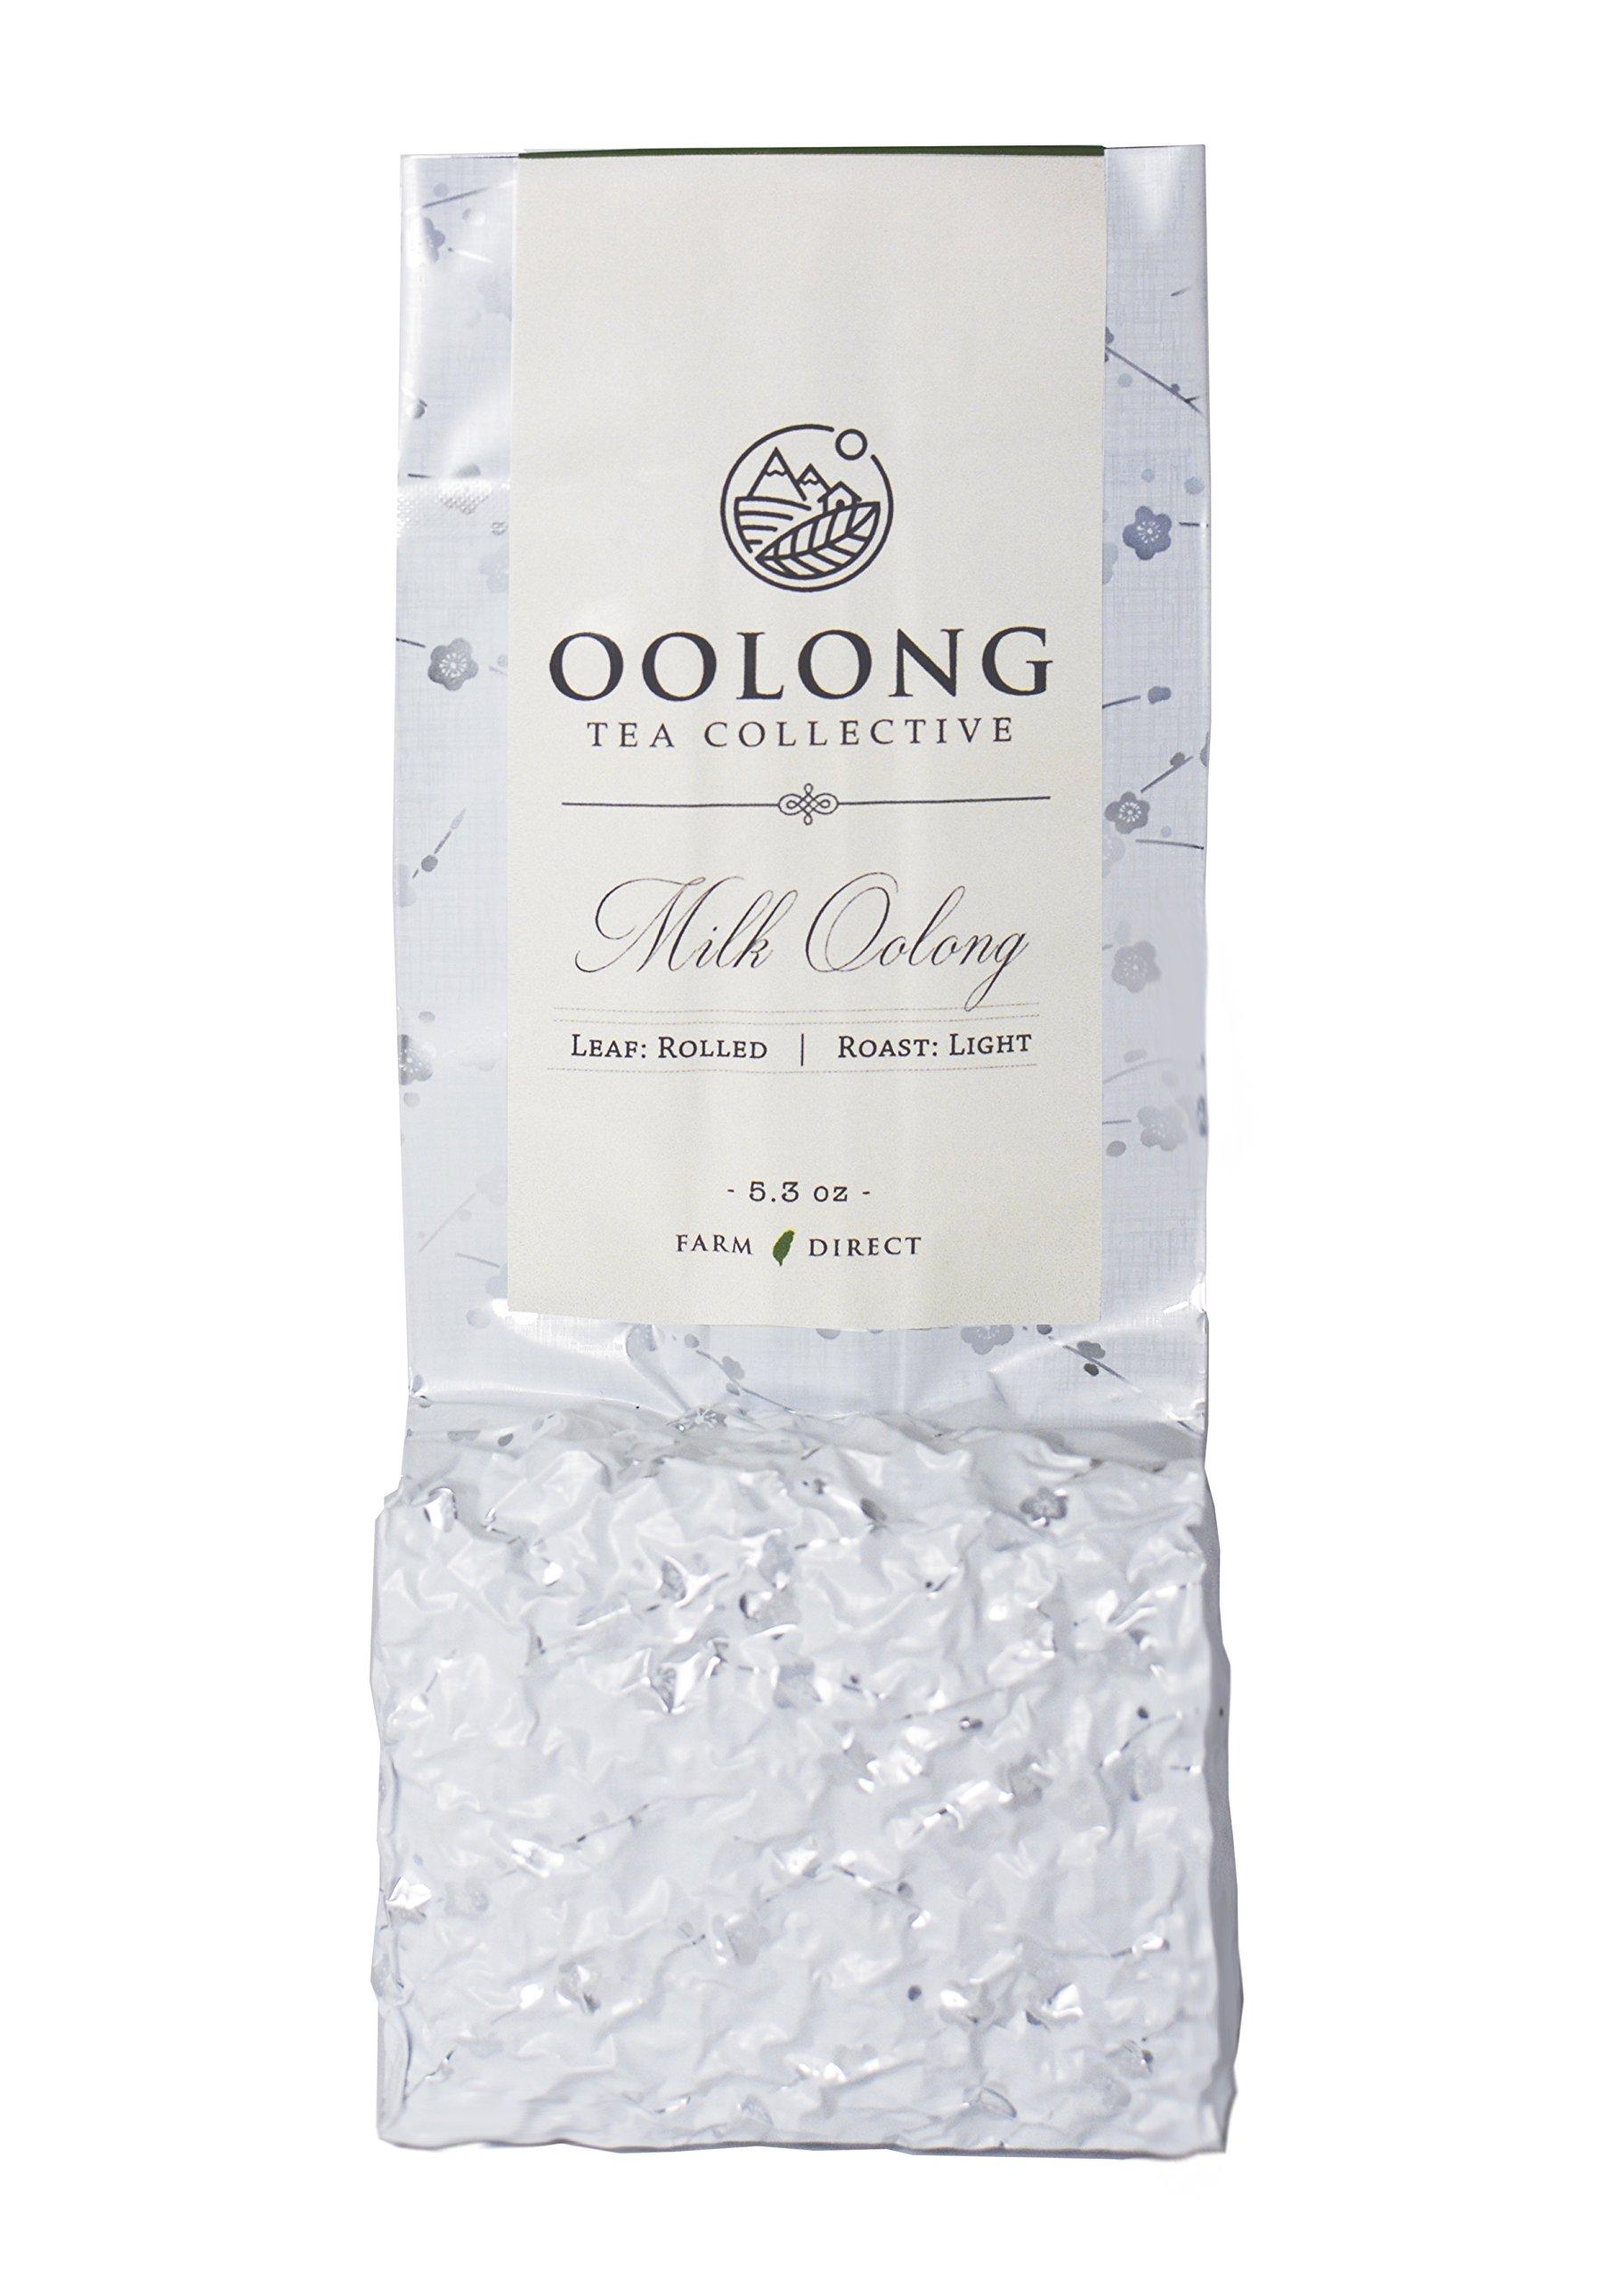 Oolong Tea Collective - JinXuan Milk Oolong Tea - 2018 Fresh Harvest - Handpicked - Natural Loose Leaf Tea - No Additives - 100% Taiwan Farm Direct (5.3oz)